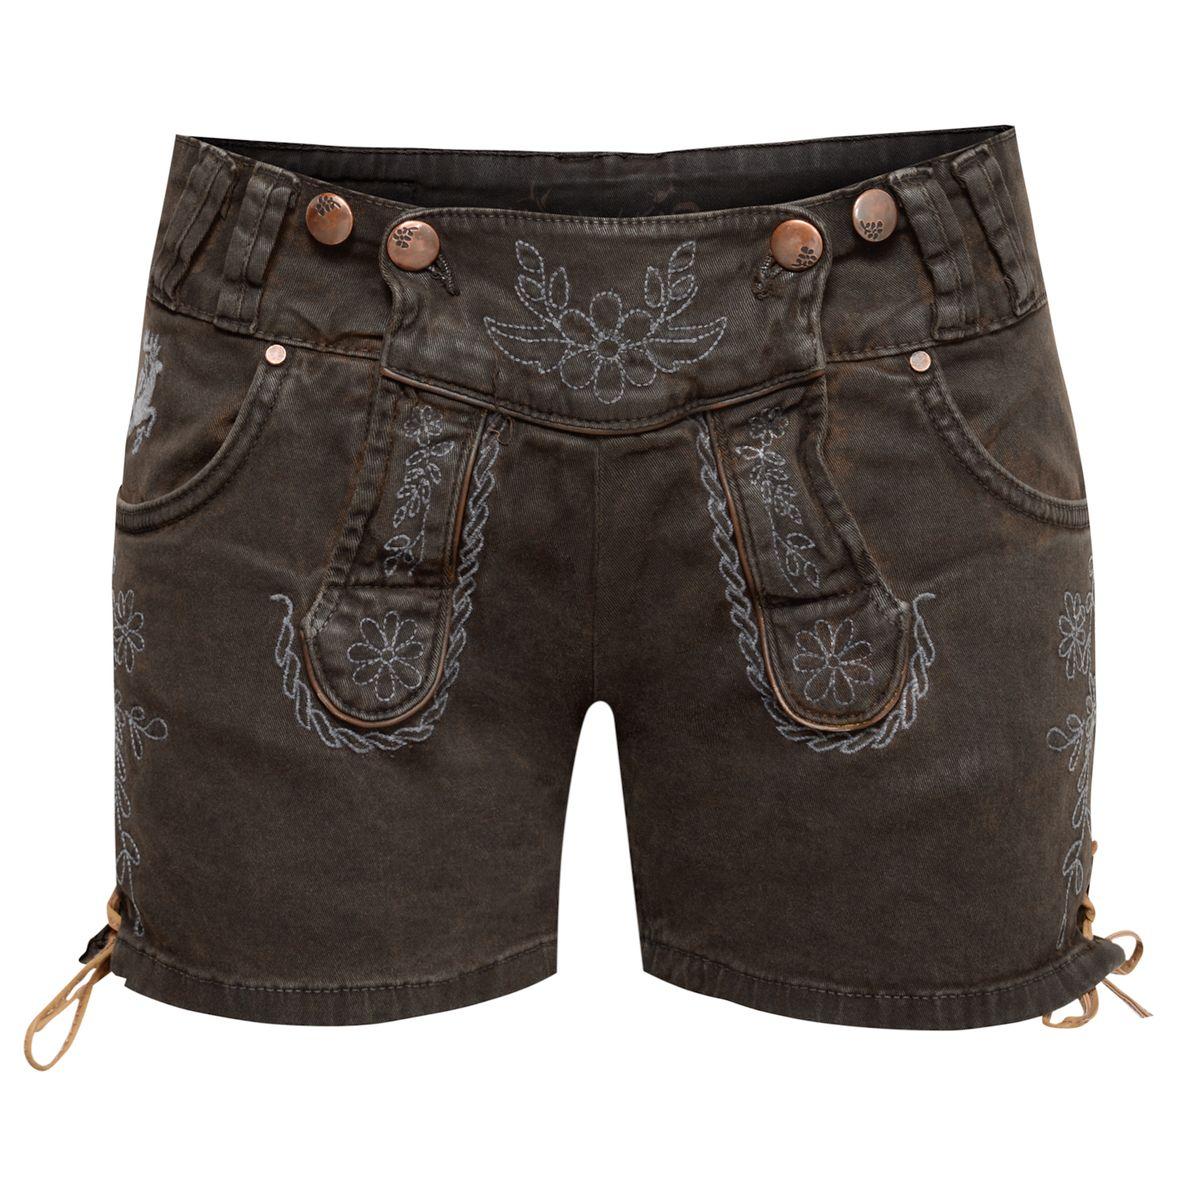 kurze jeans lederhose evarl in dunkelbraun von hangowear damen lederhosen f r damen kurze lederhosen. Black Bedroom Furniture Sets. Home Design Ideas